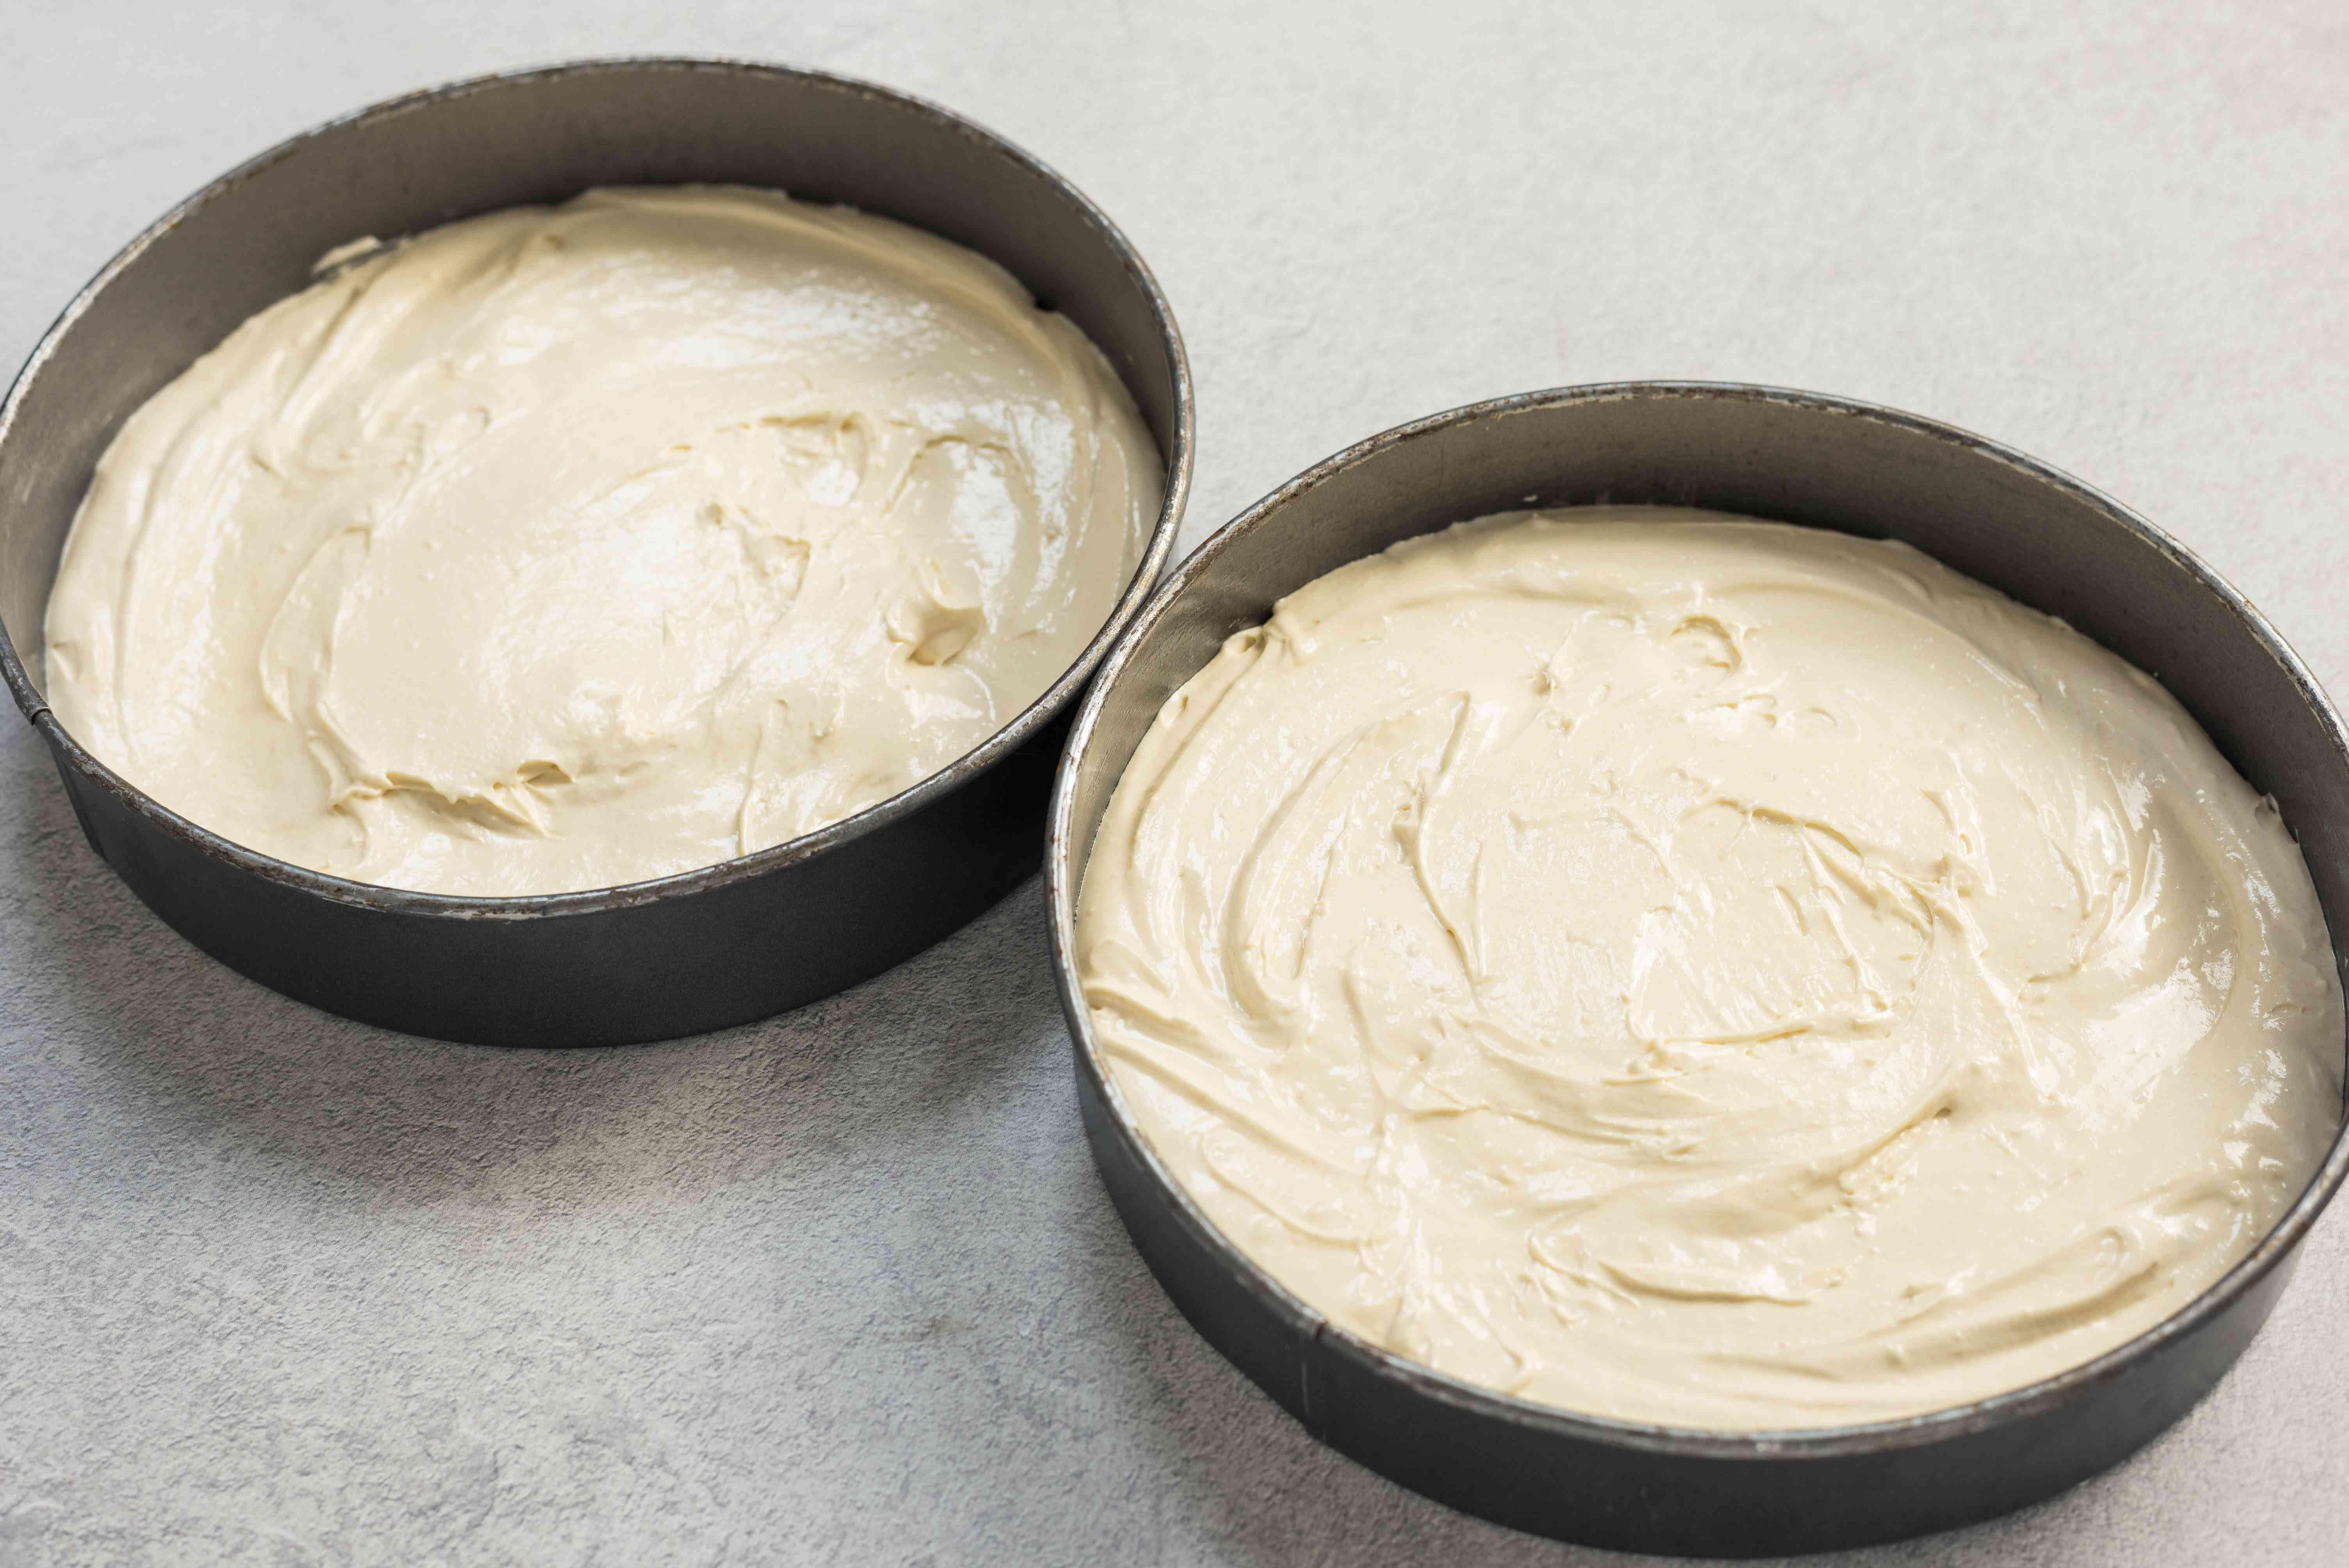 Pour batter into cake pan